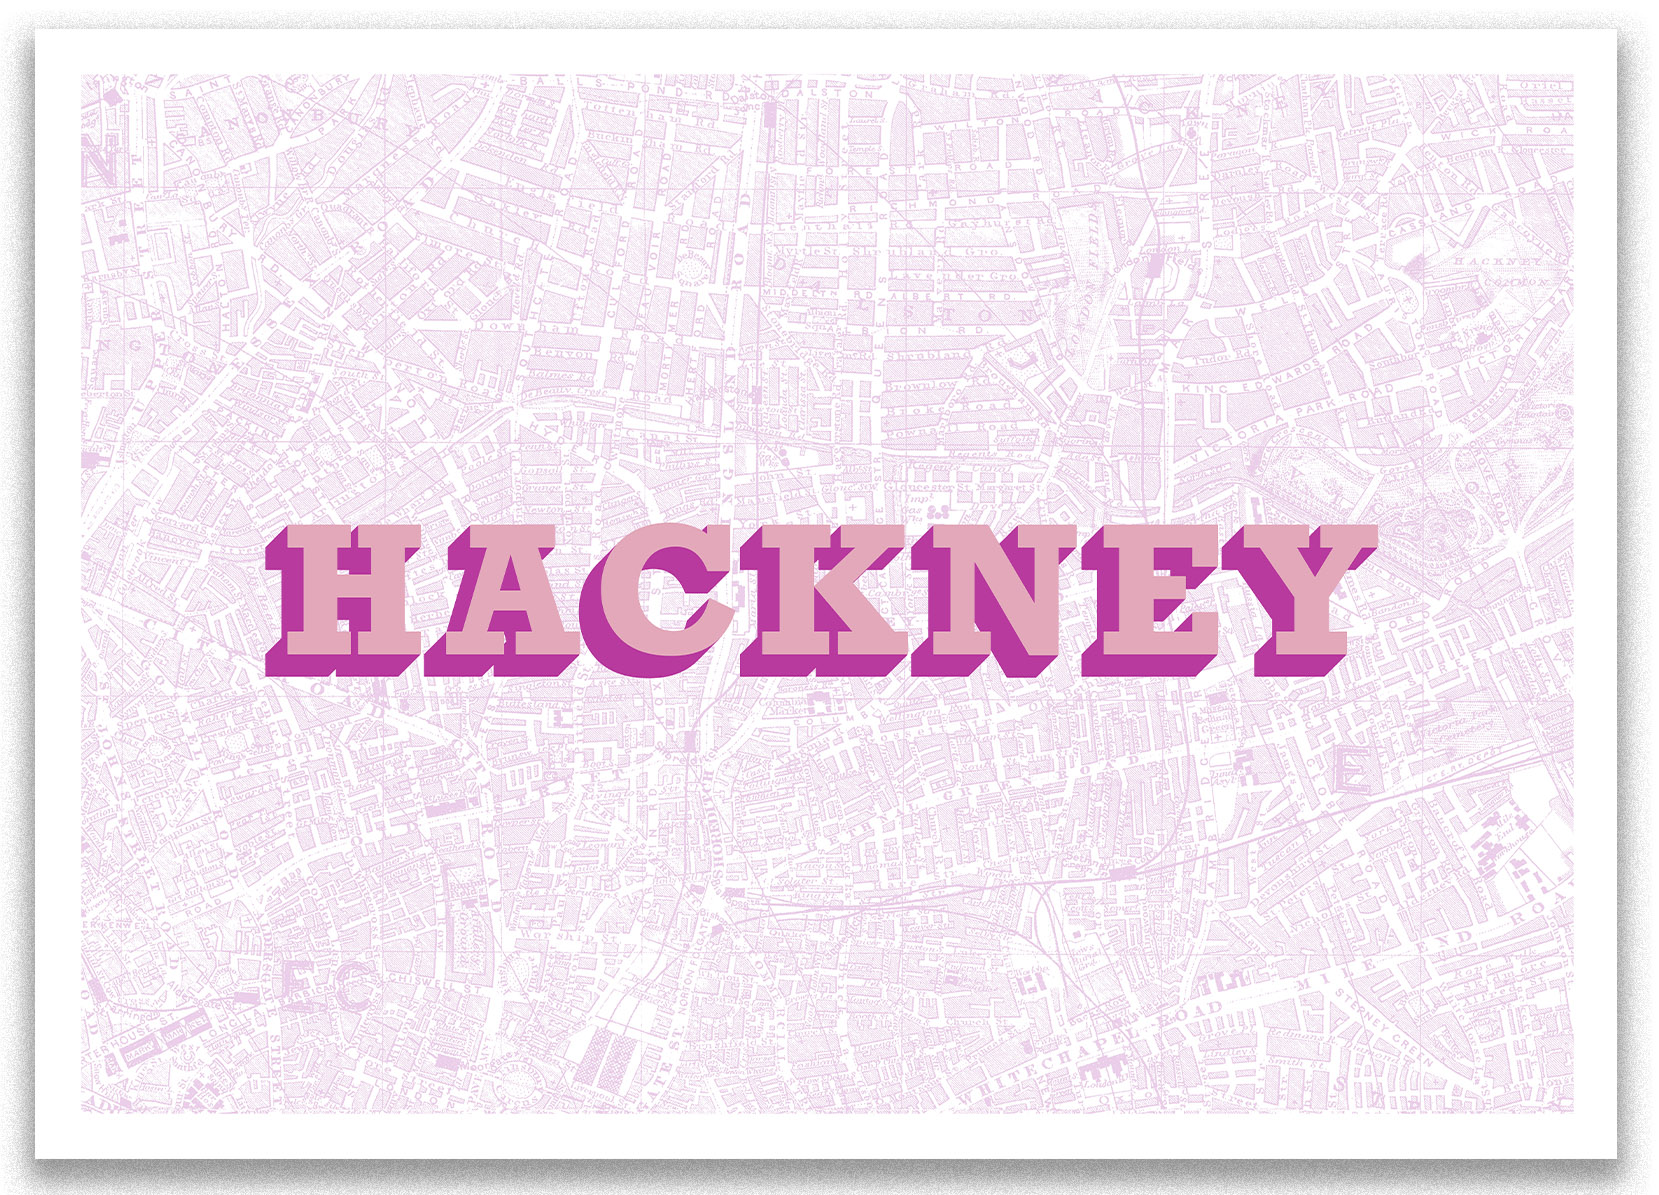 Hackney 2 grey outline.jpg